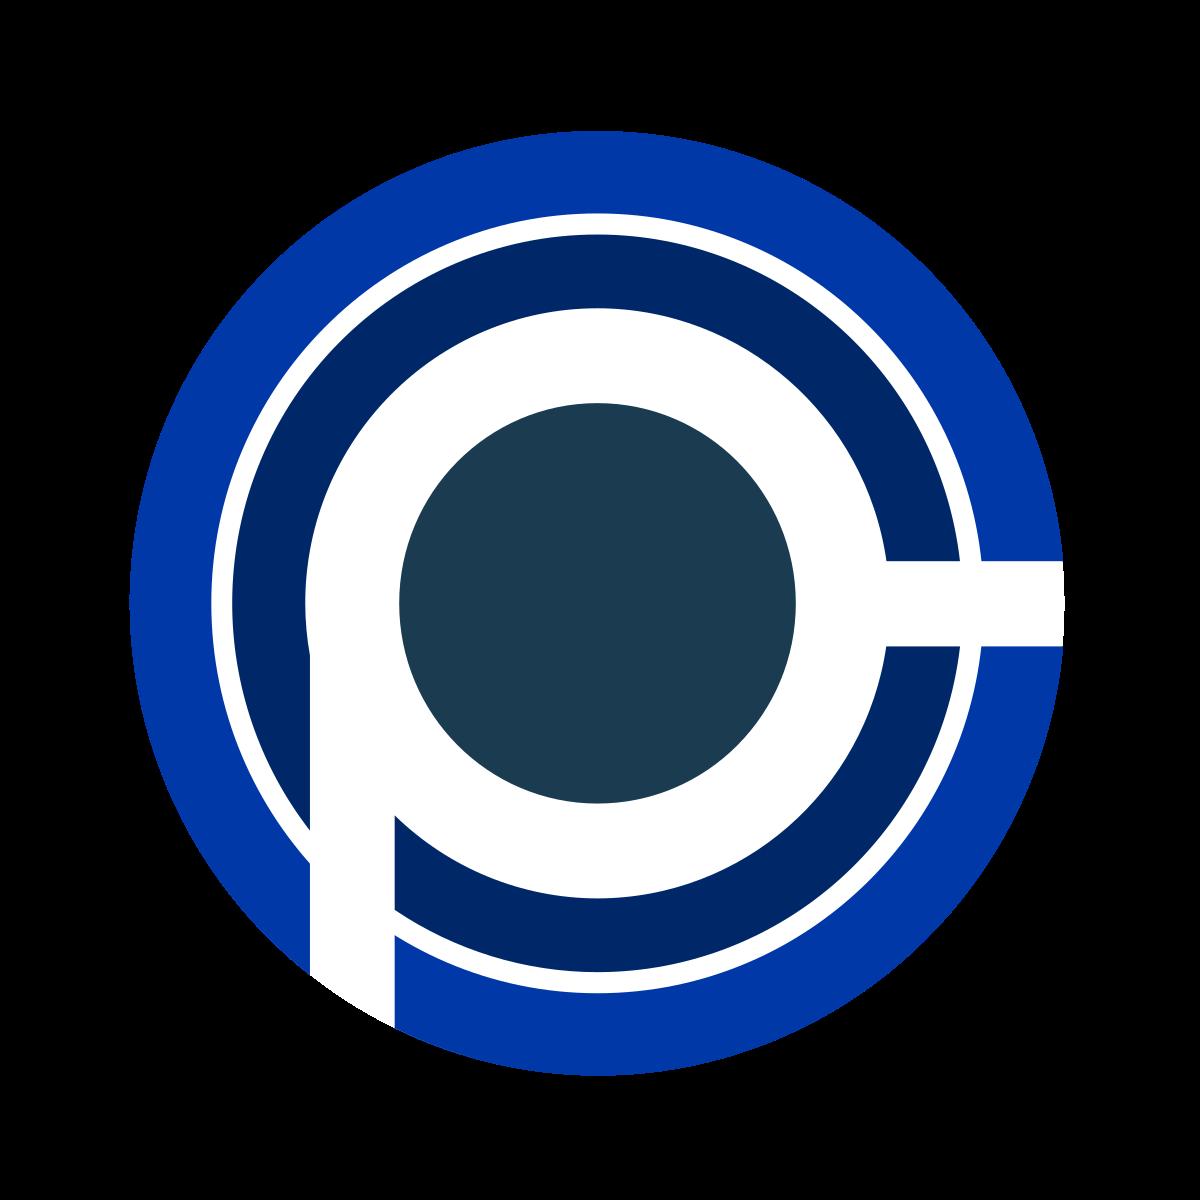 Philippine commission wikipedia . Competition clipart litigation